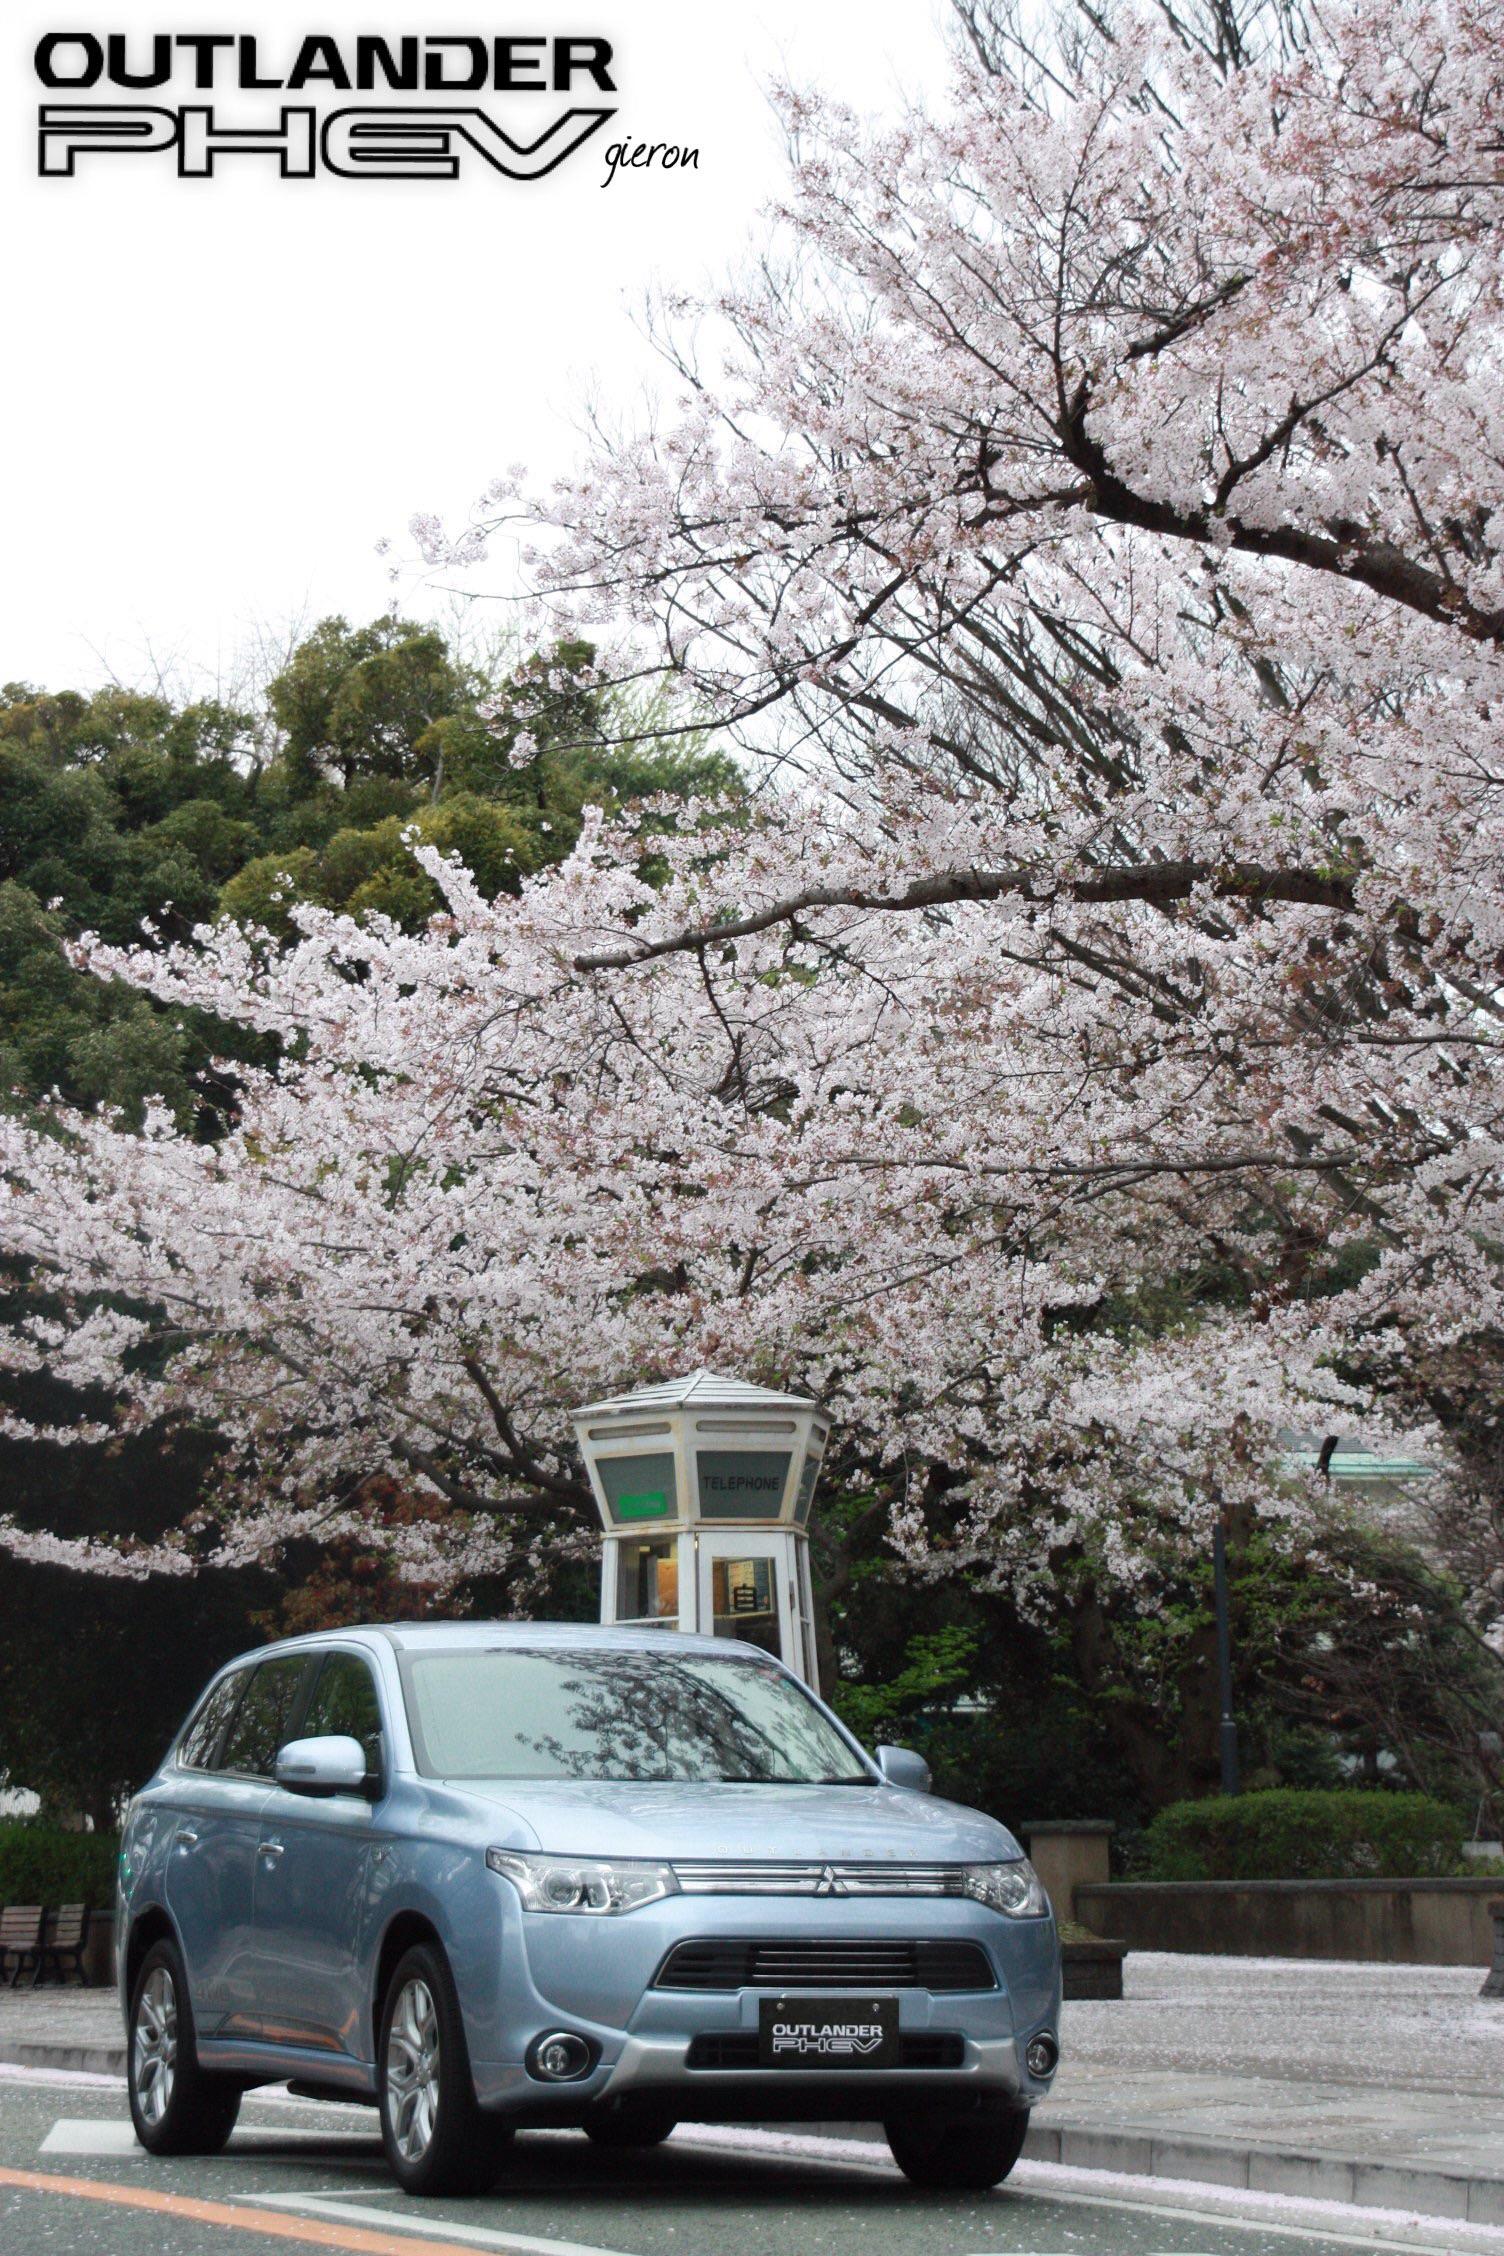 Mitsubishi Outlander アウトランダーPHEV 桜